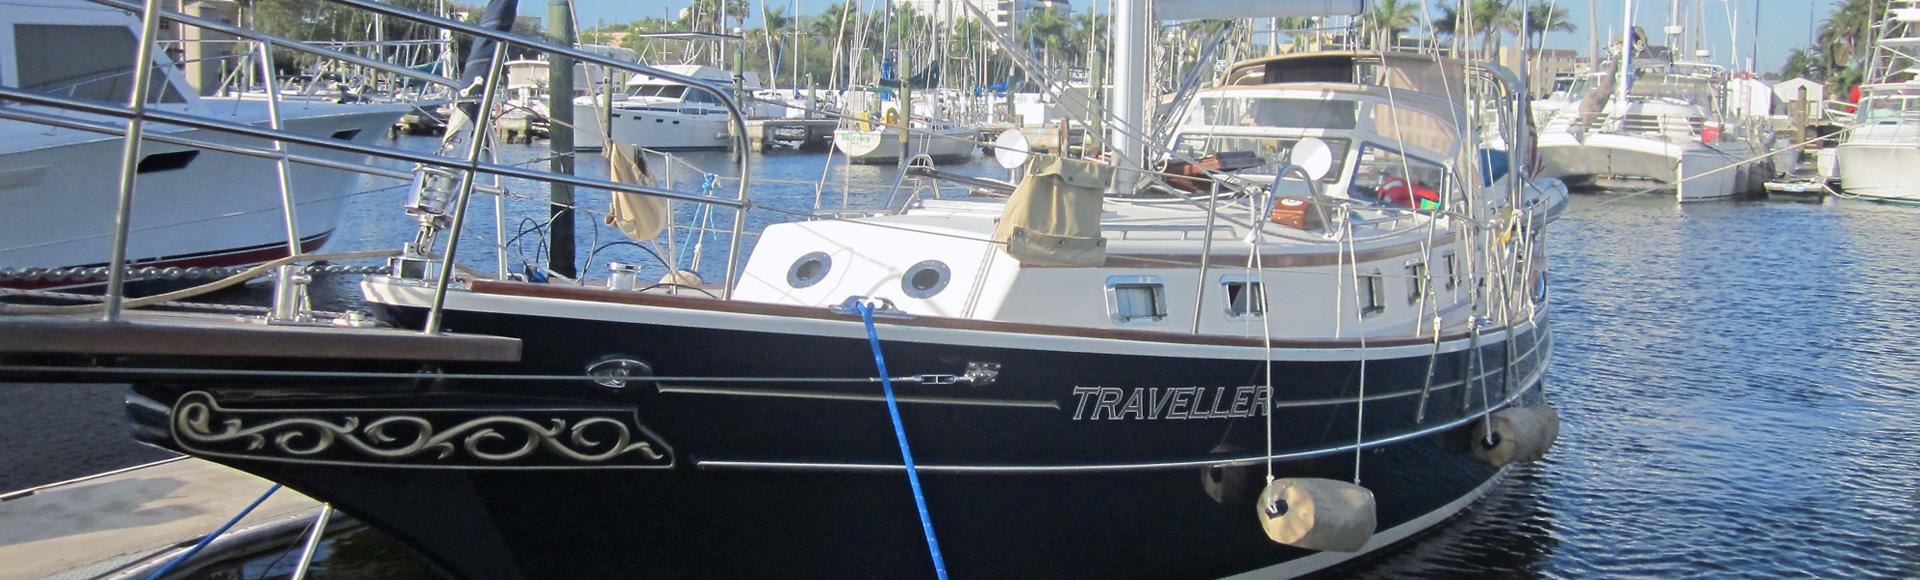 "2002 Gozzard 37A Hull #12 ""Traveller"""